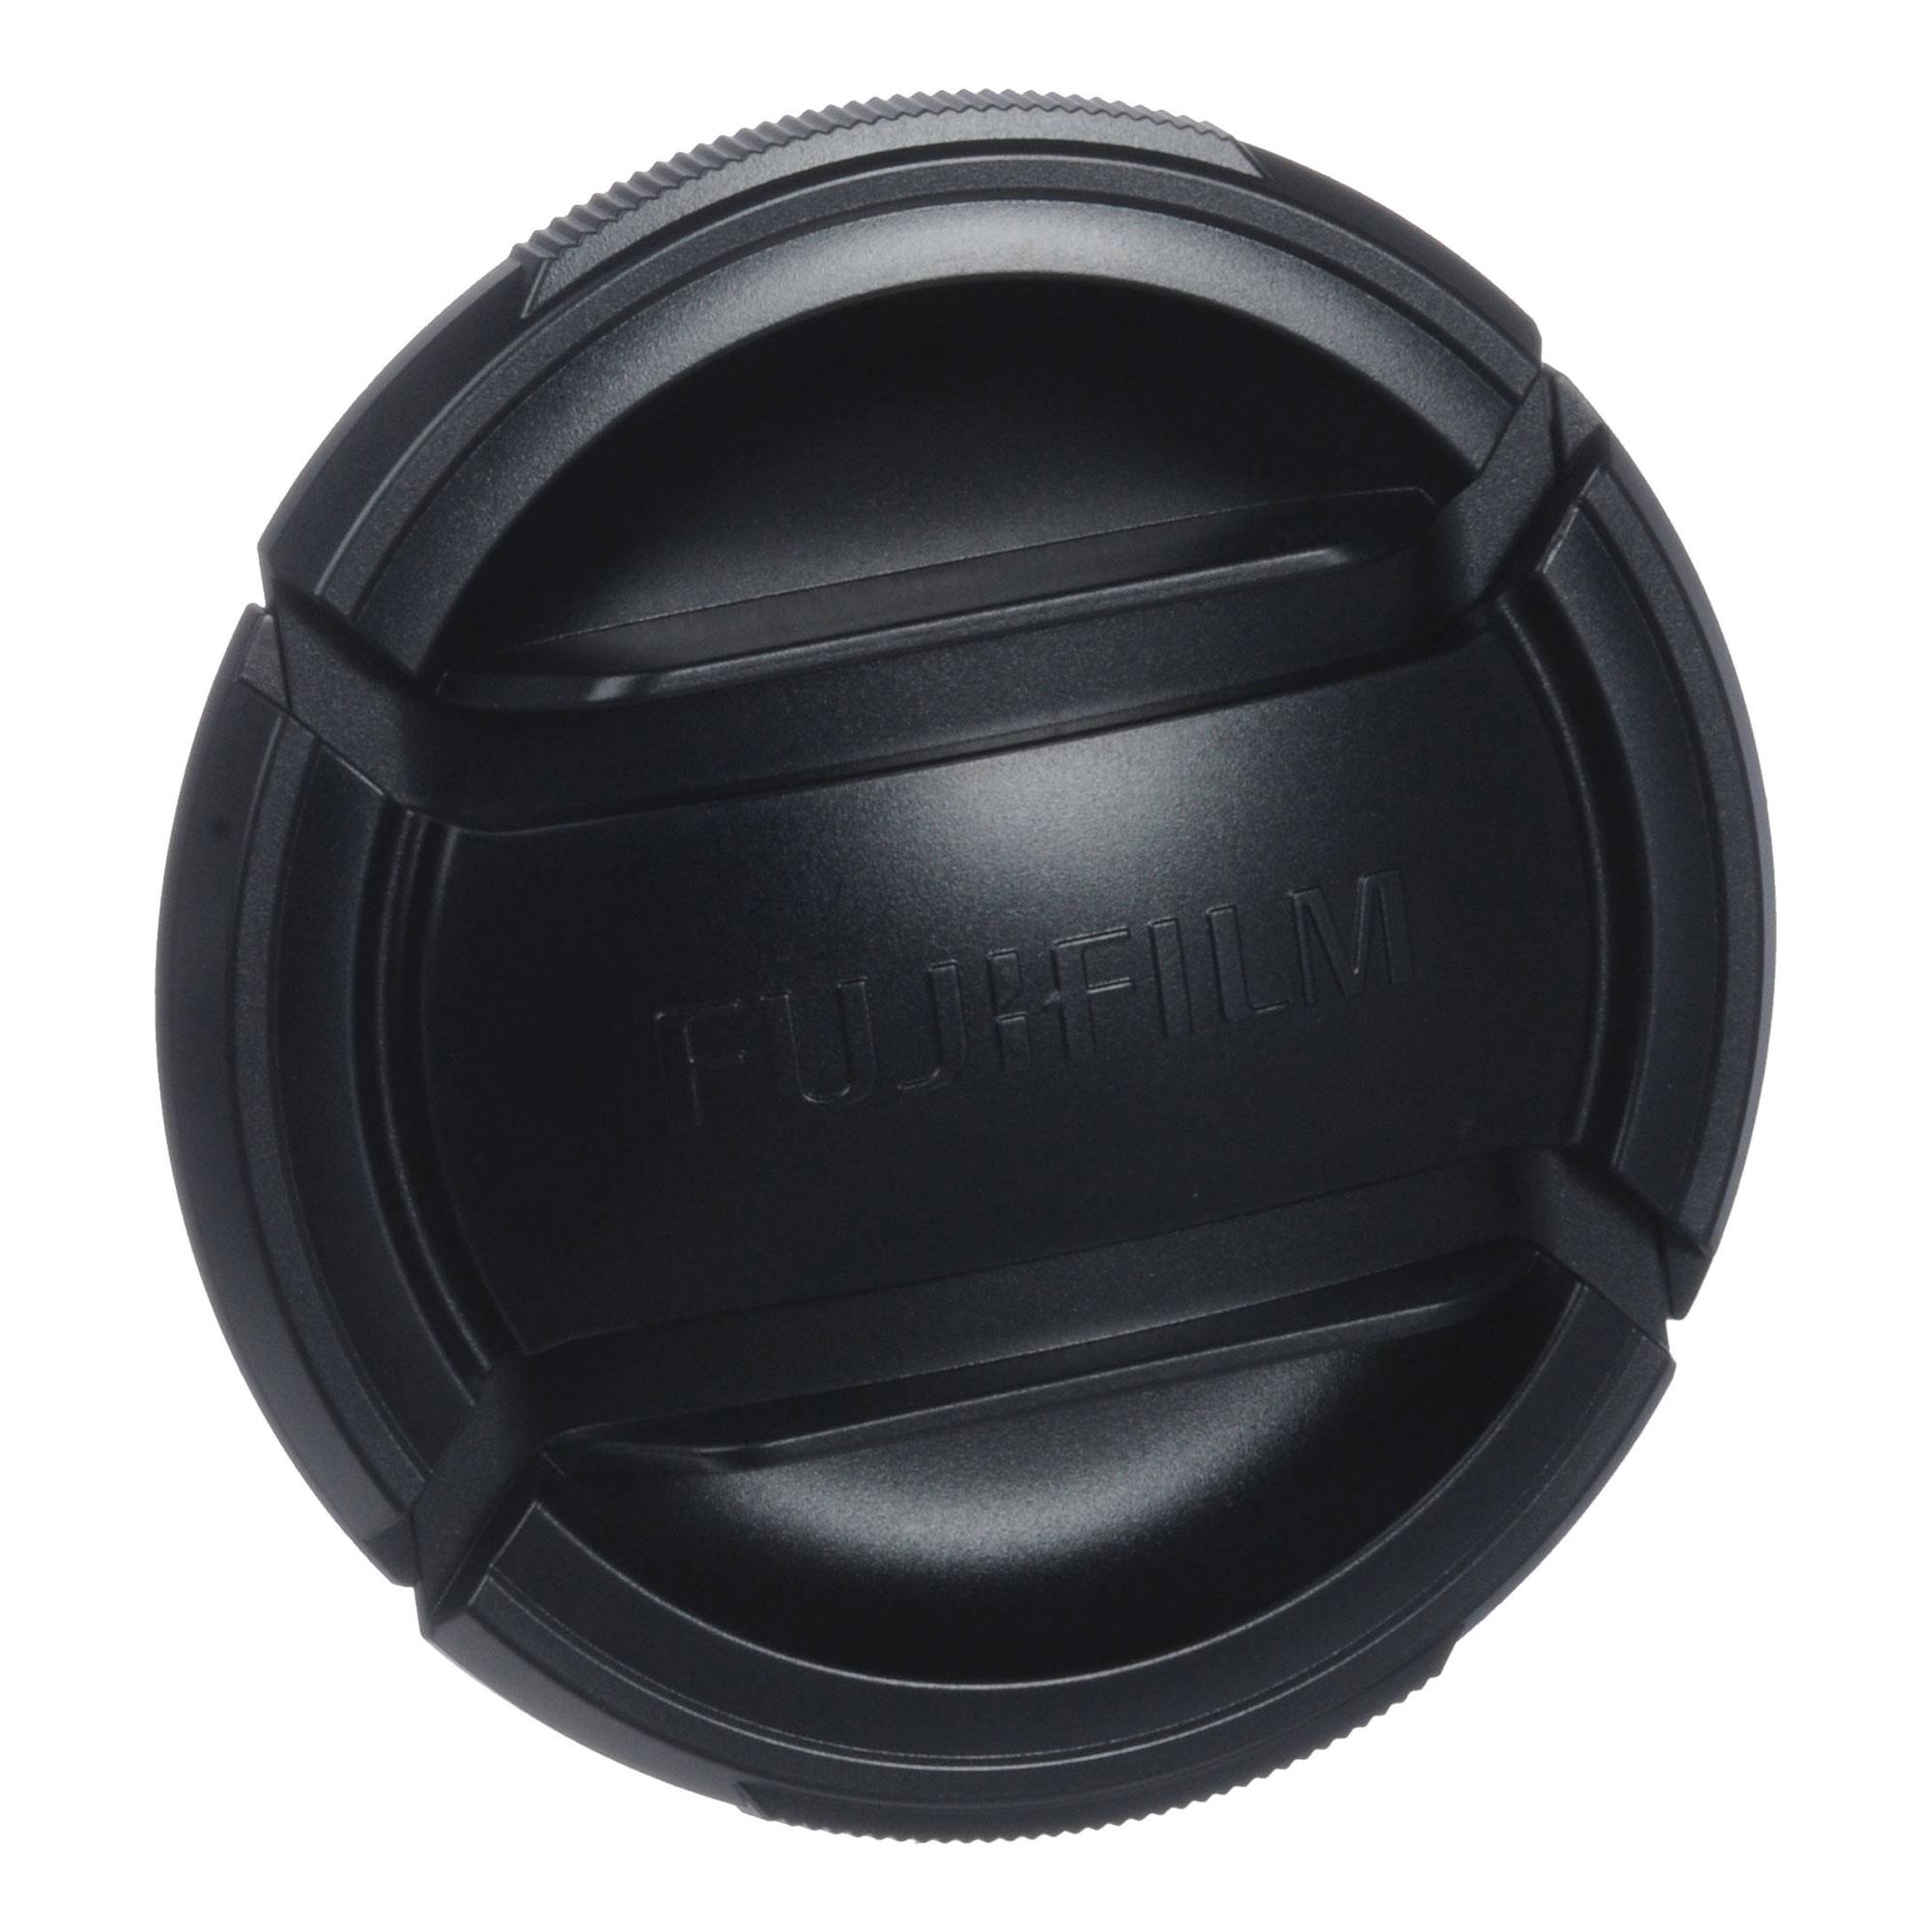 72mm Front Lens Cap for Select Fujinon X-Mount Lenses